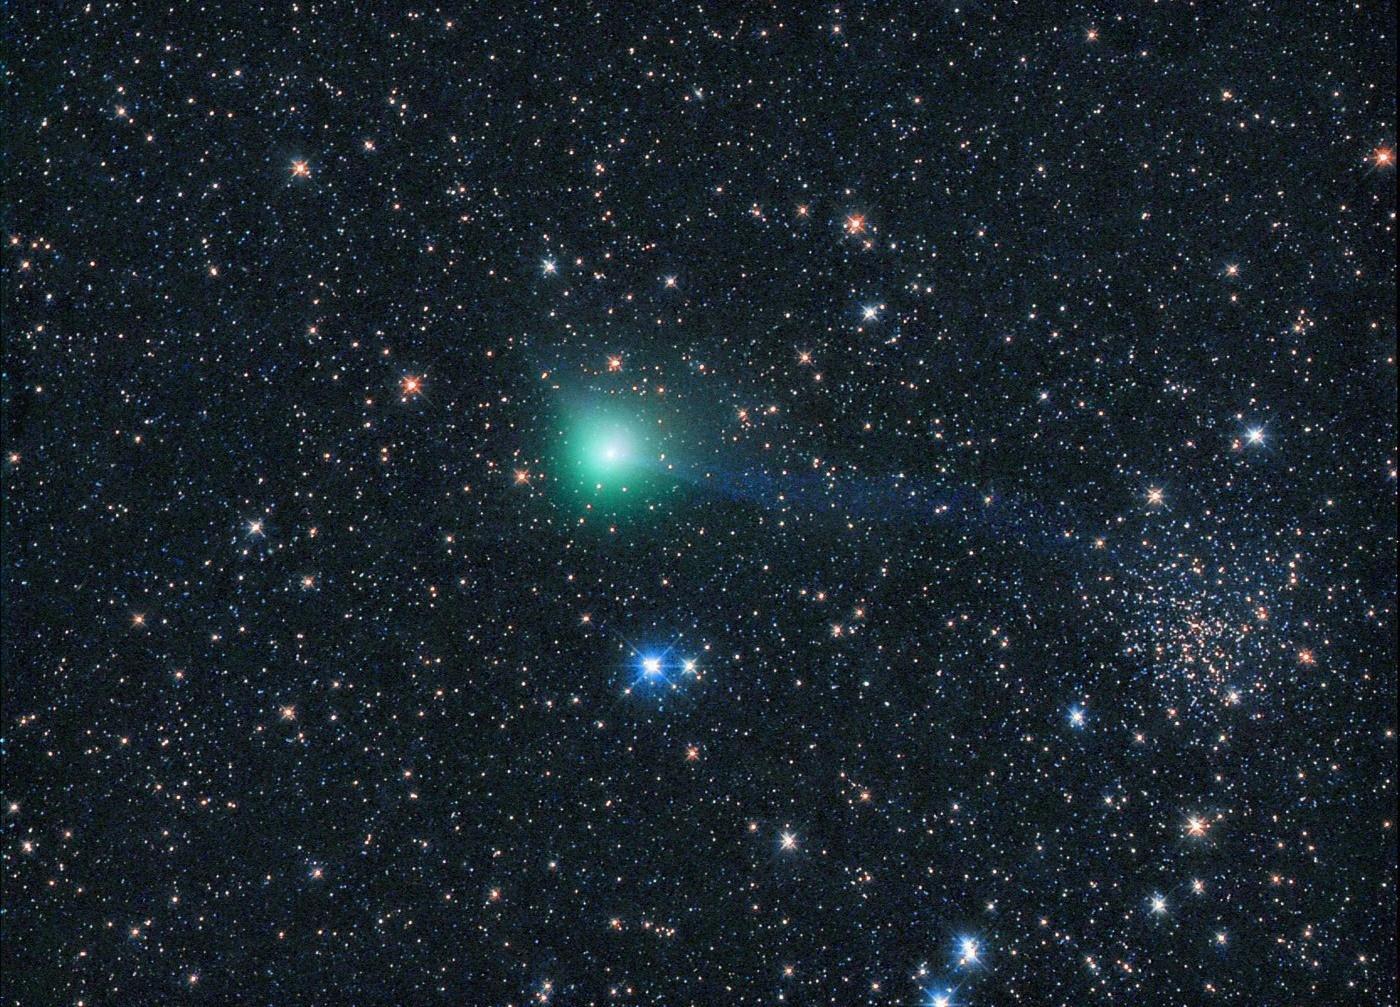 Cometa C/2014 Q2 (Lovejoy)